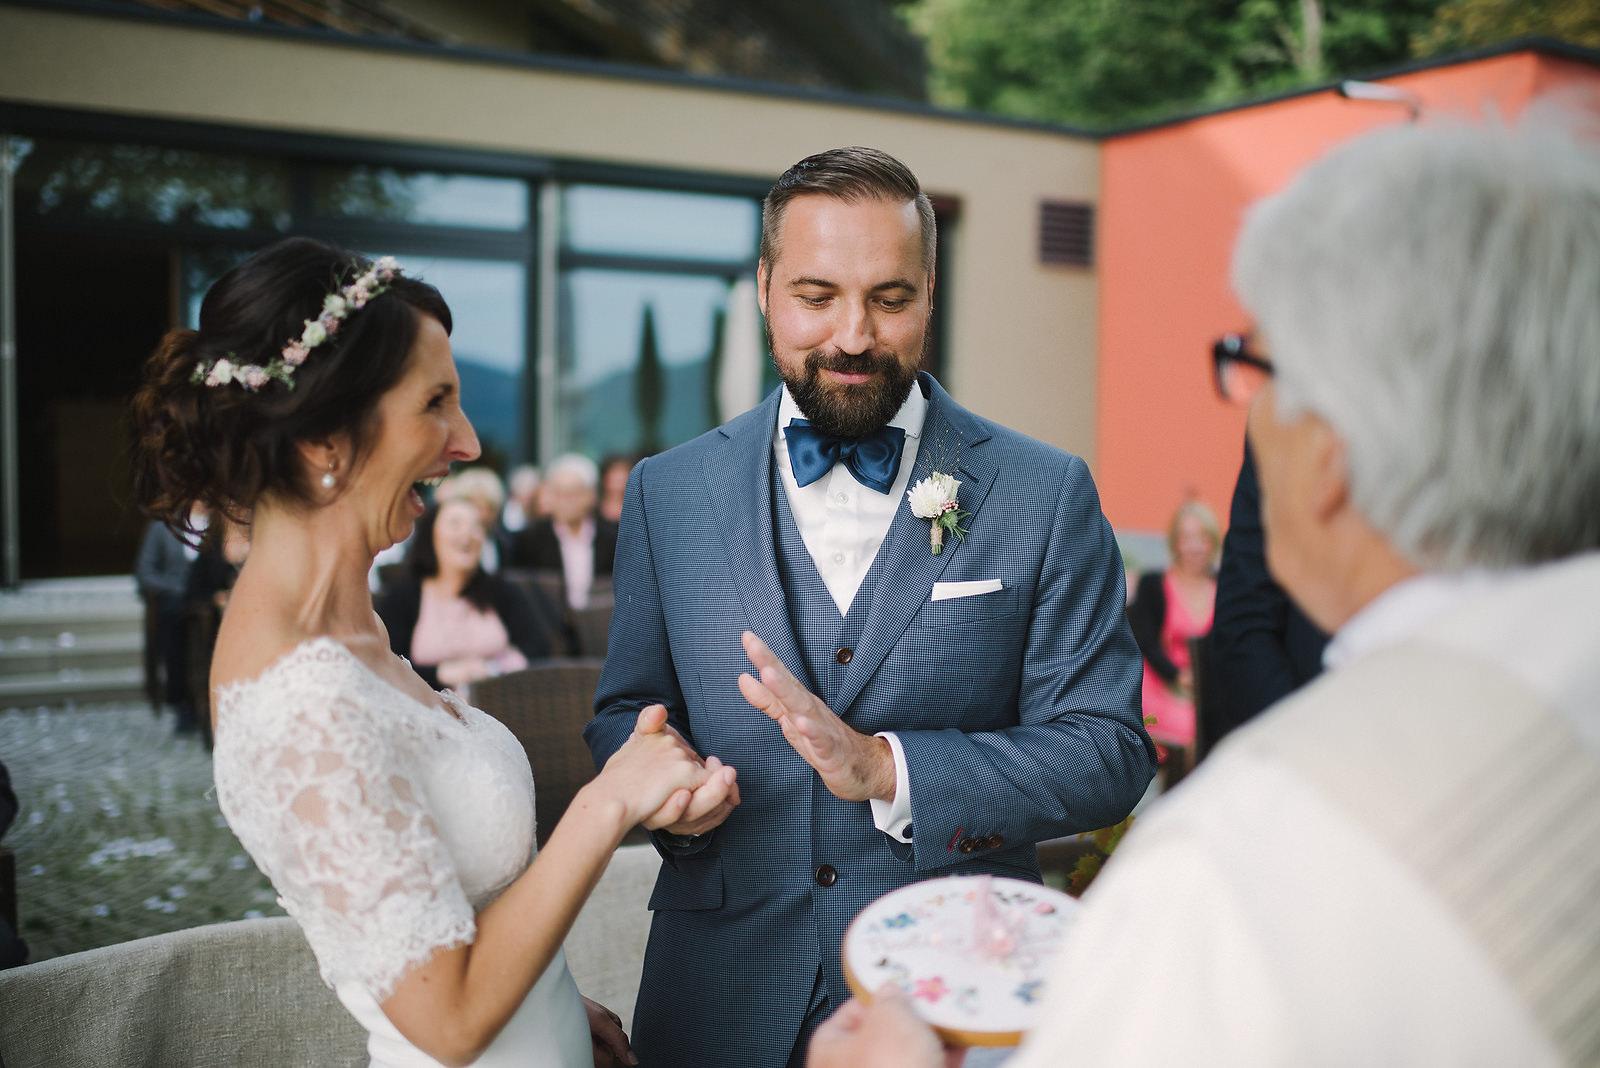 Fotograf Konstanz - Hochzeitsfotograf Reutlingen Achalm Hochzeit EFP 49 - Als Hochzeitsfotograf auf der Achalm, Reutlingen  - 40 -